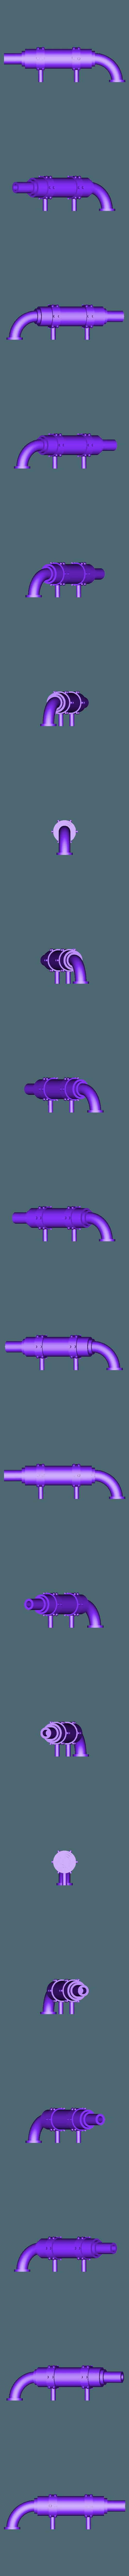 Exhaust_x2.stl Download free STL file Sigilates Shooty Shooty Dakka Defense Boat • Design to 3D print, danny_cyanide